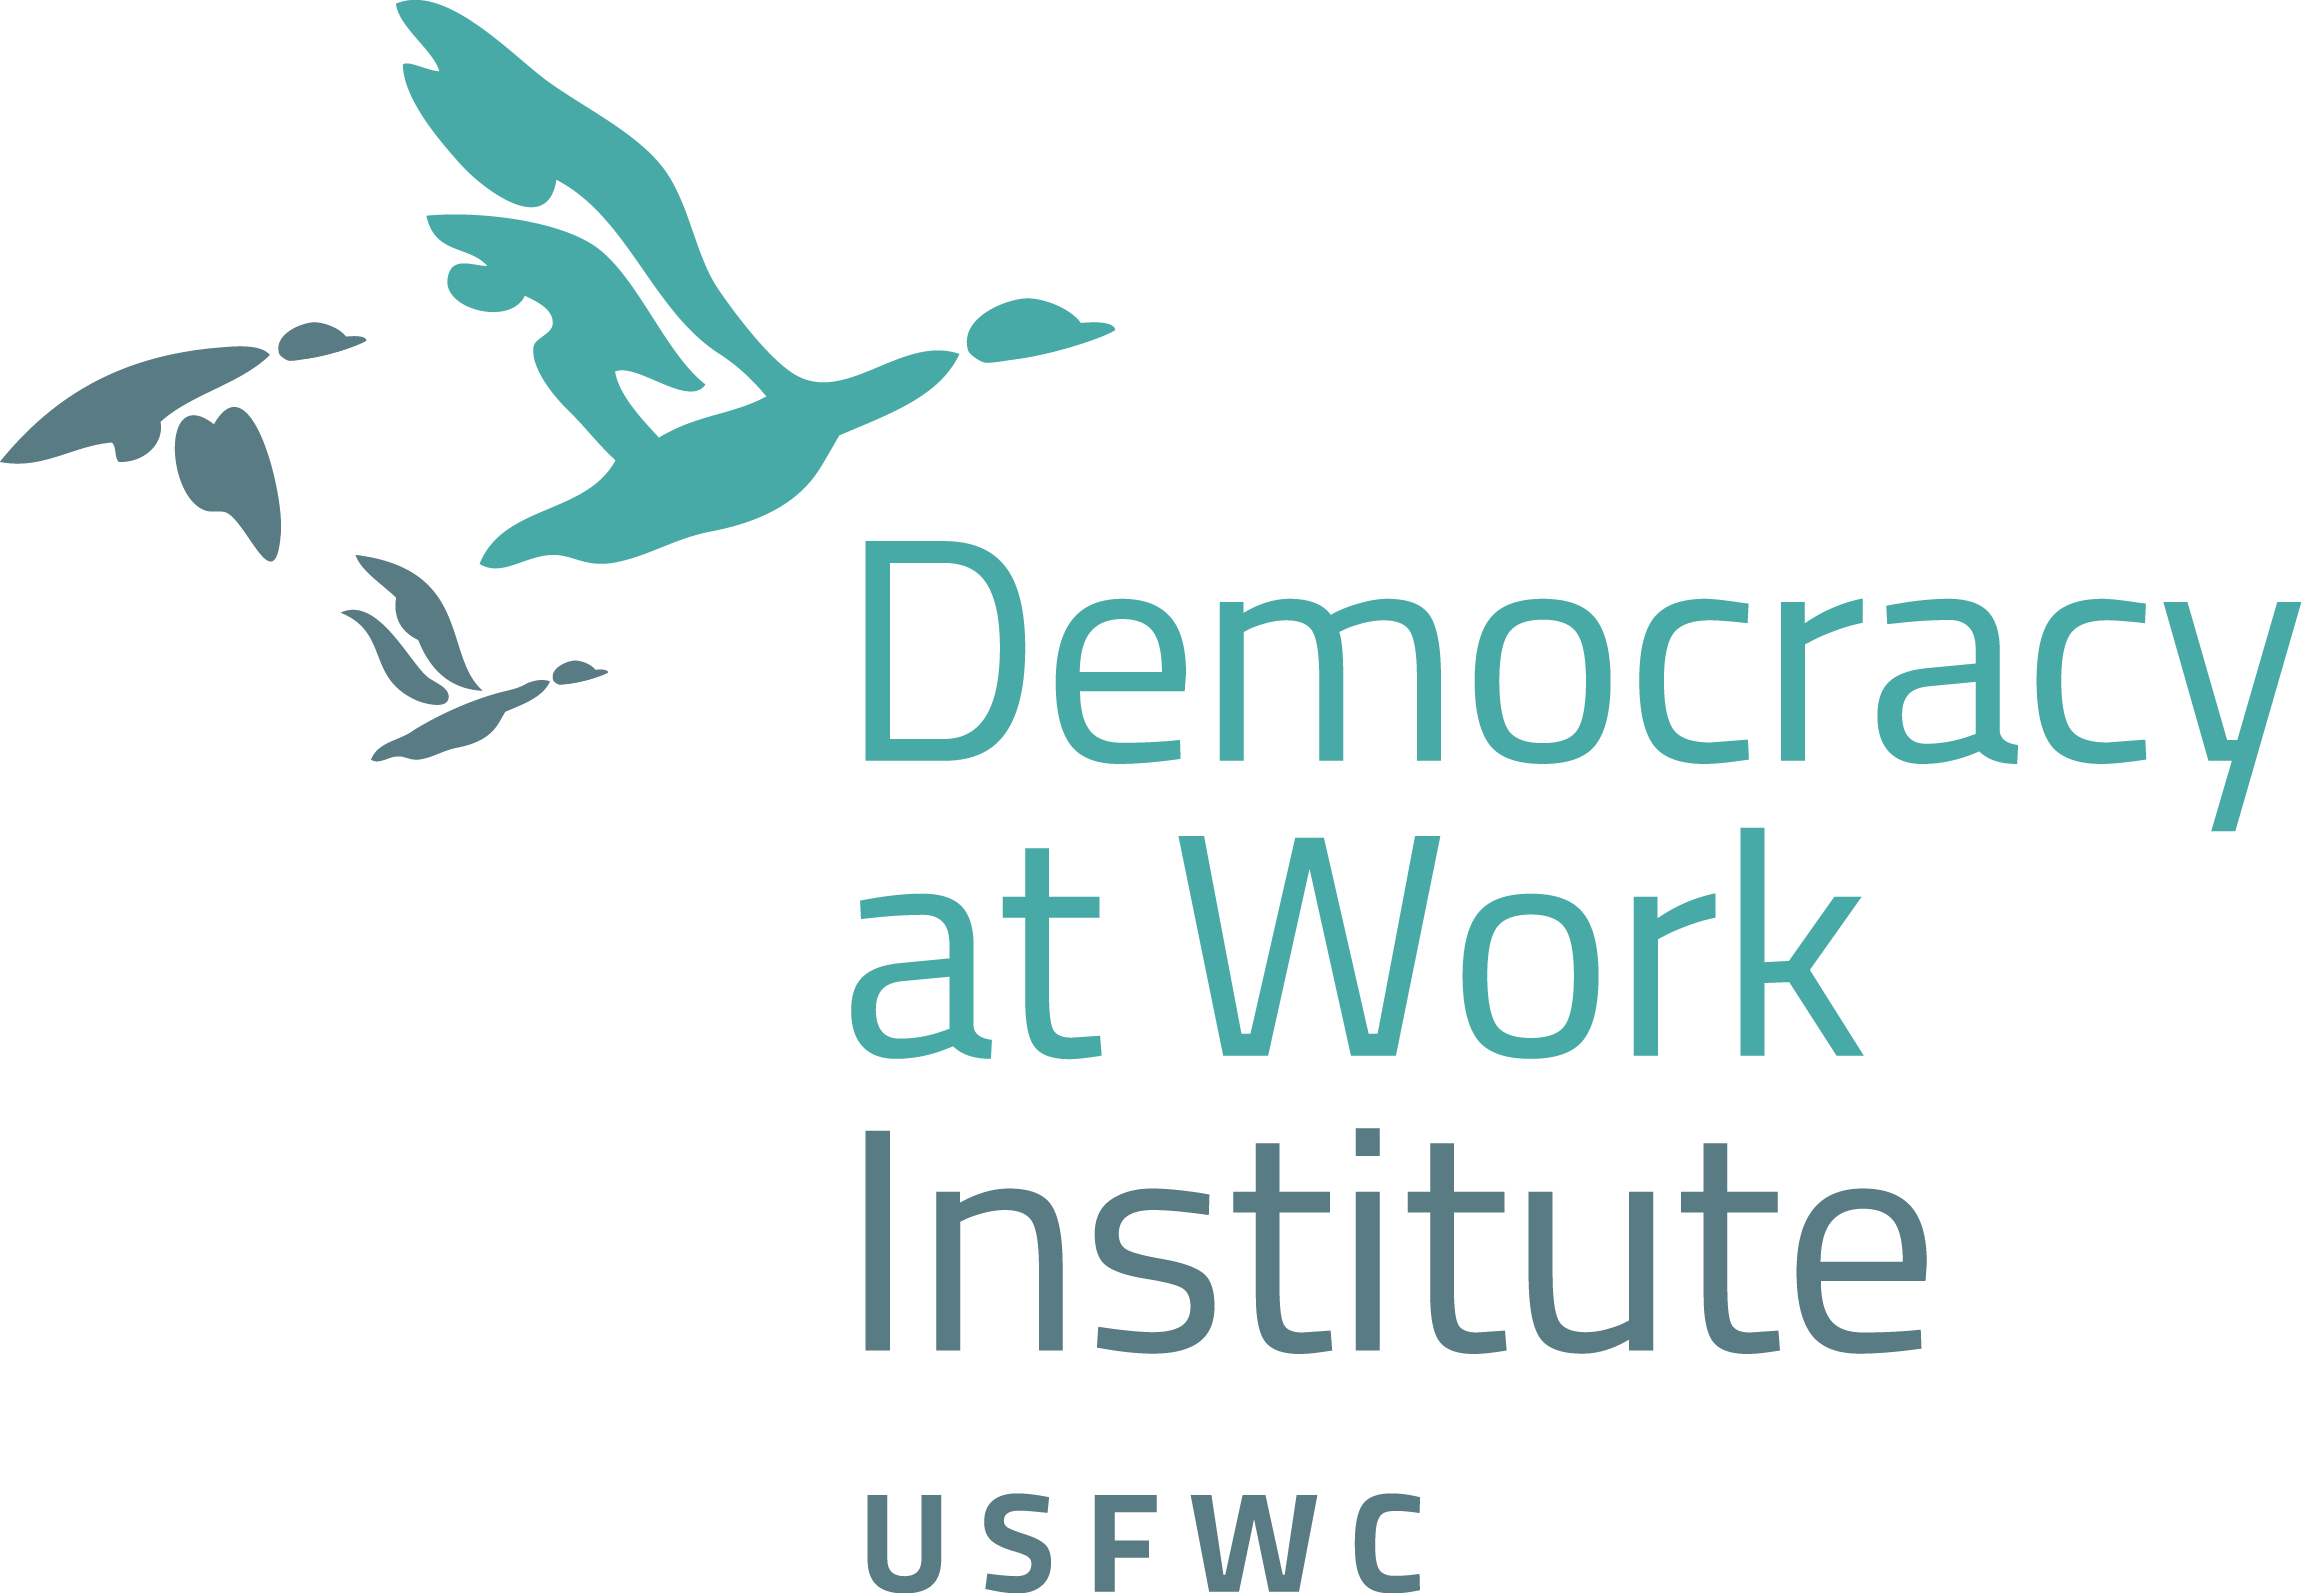 DAWI_democracy_at_work_institute_logo.png